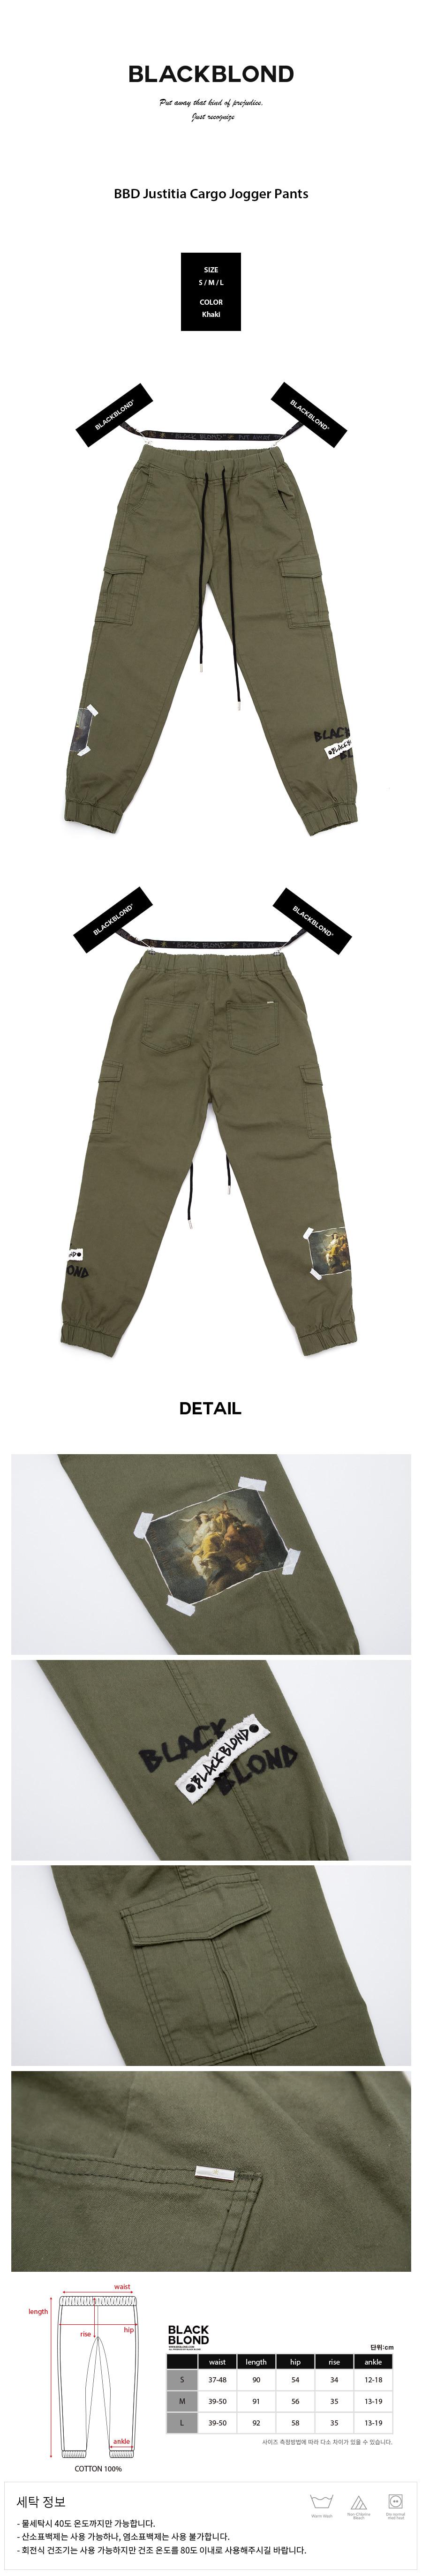 BBD-Justitia-Cargo-Jogger-Pants-%28Khaki%29.jpg